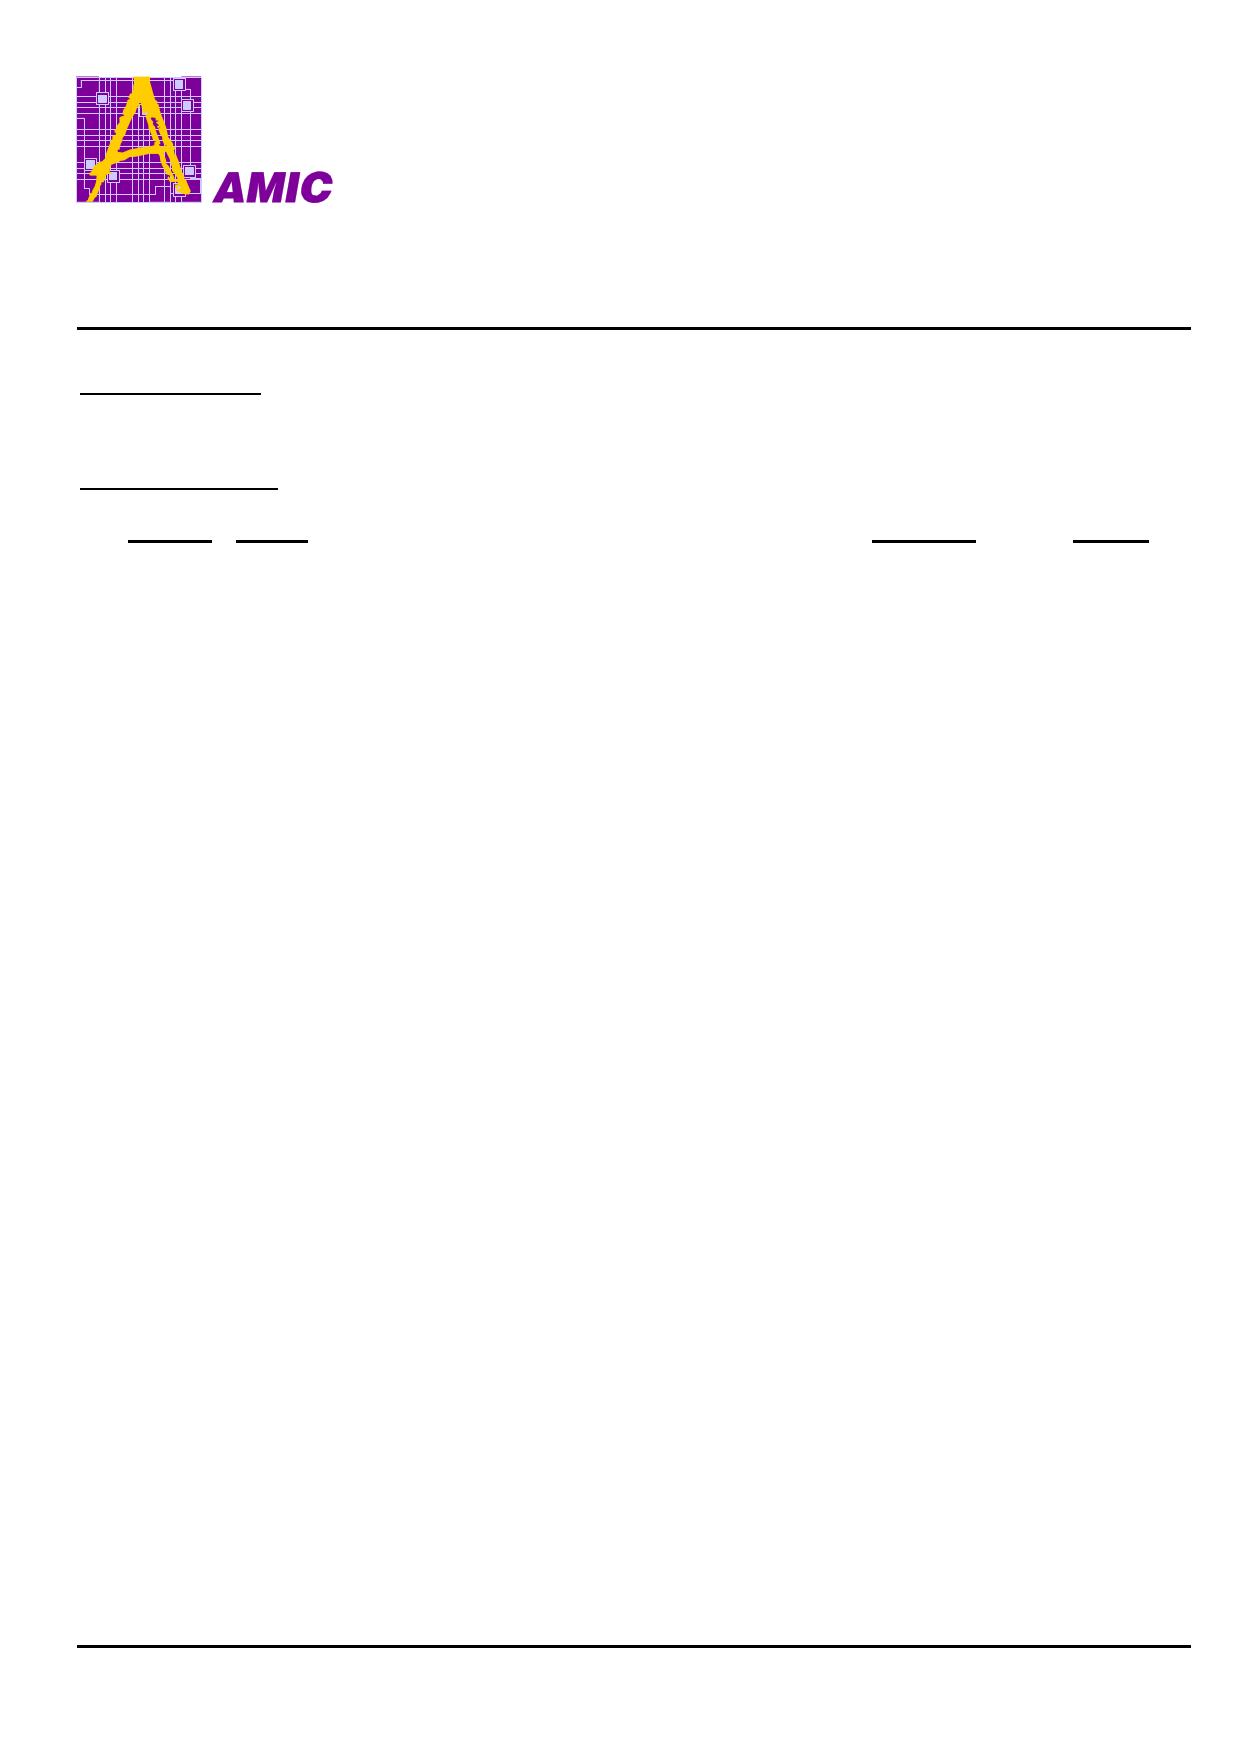 A25P020 datasheet, circuit